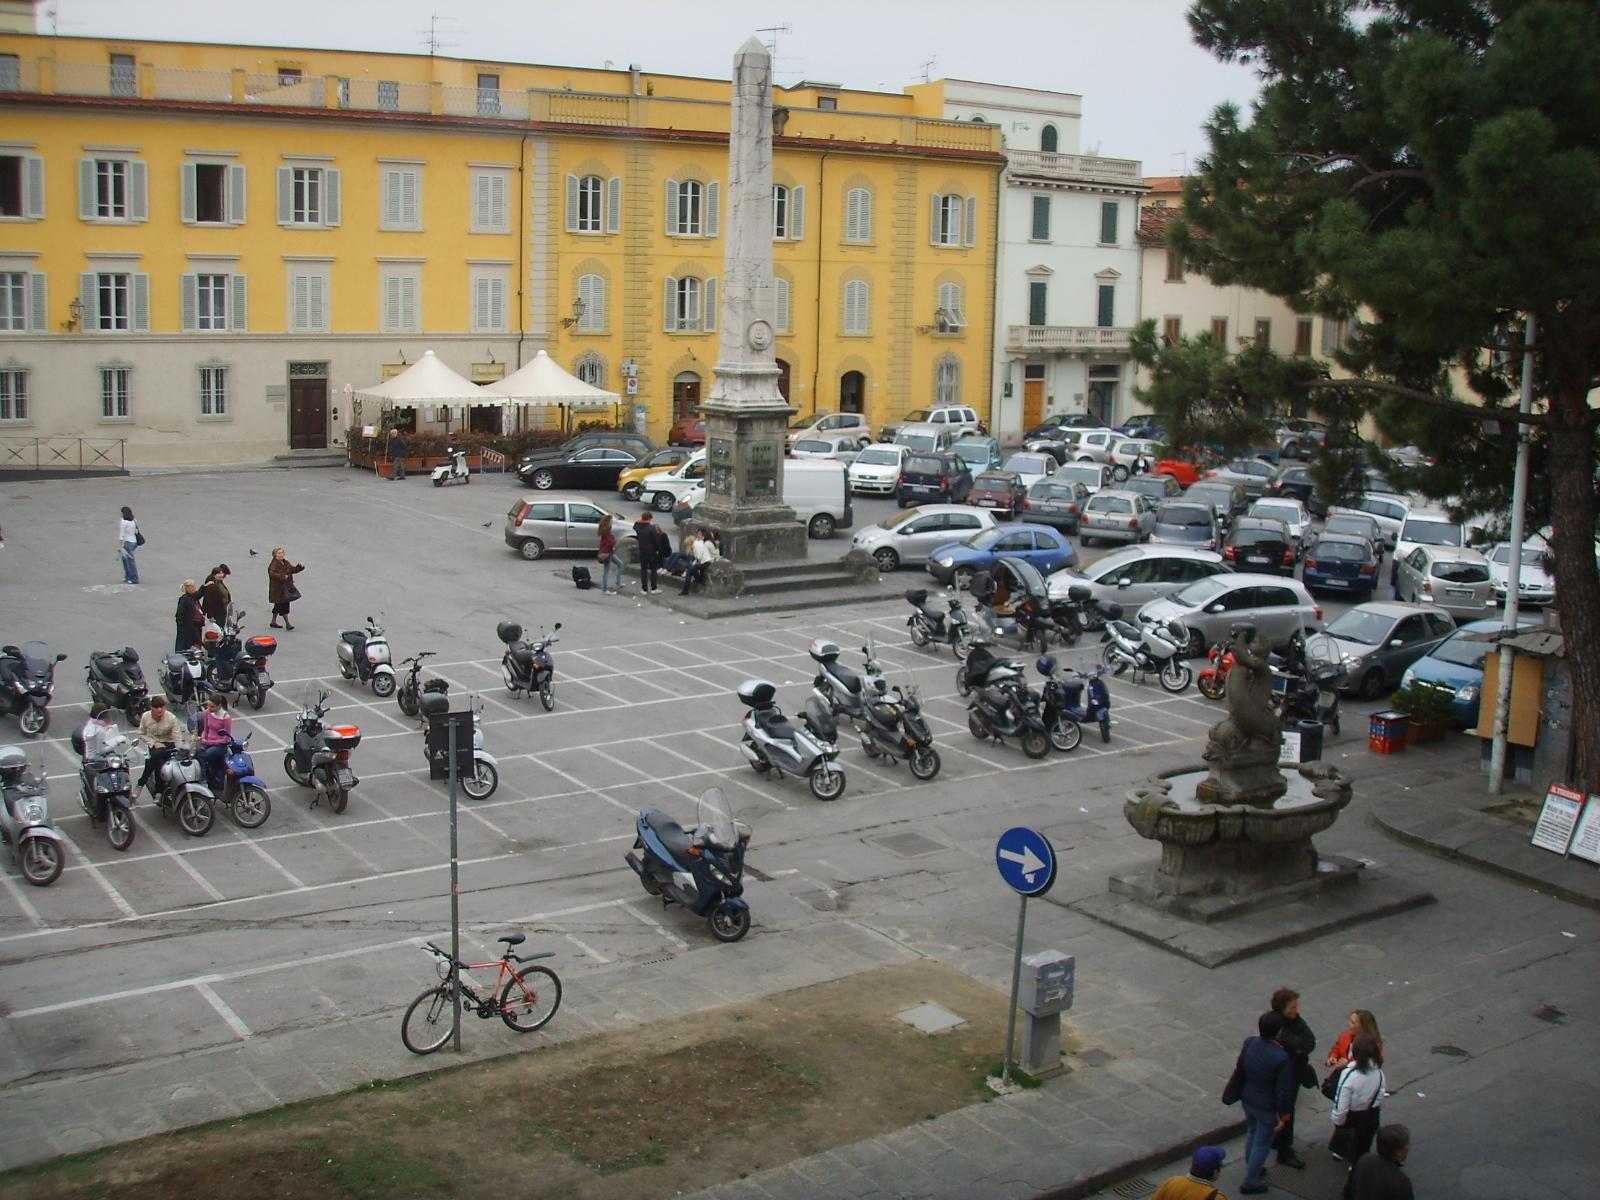 File prato piazza san francesco 02 jpg wikimedia commons for Piazza san francesco prato